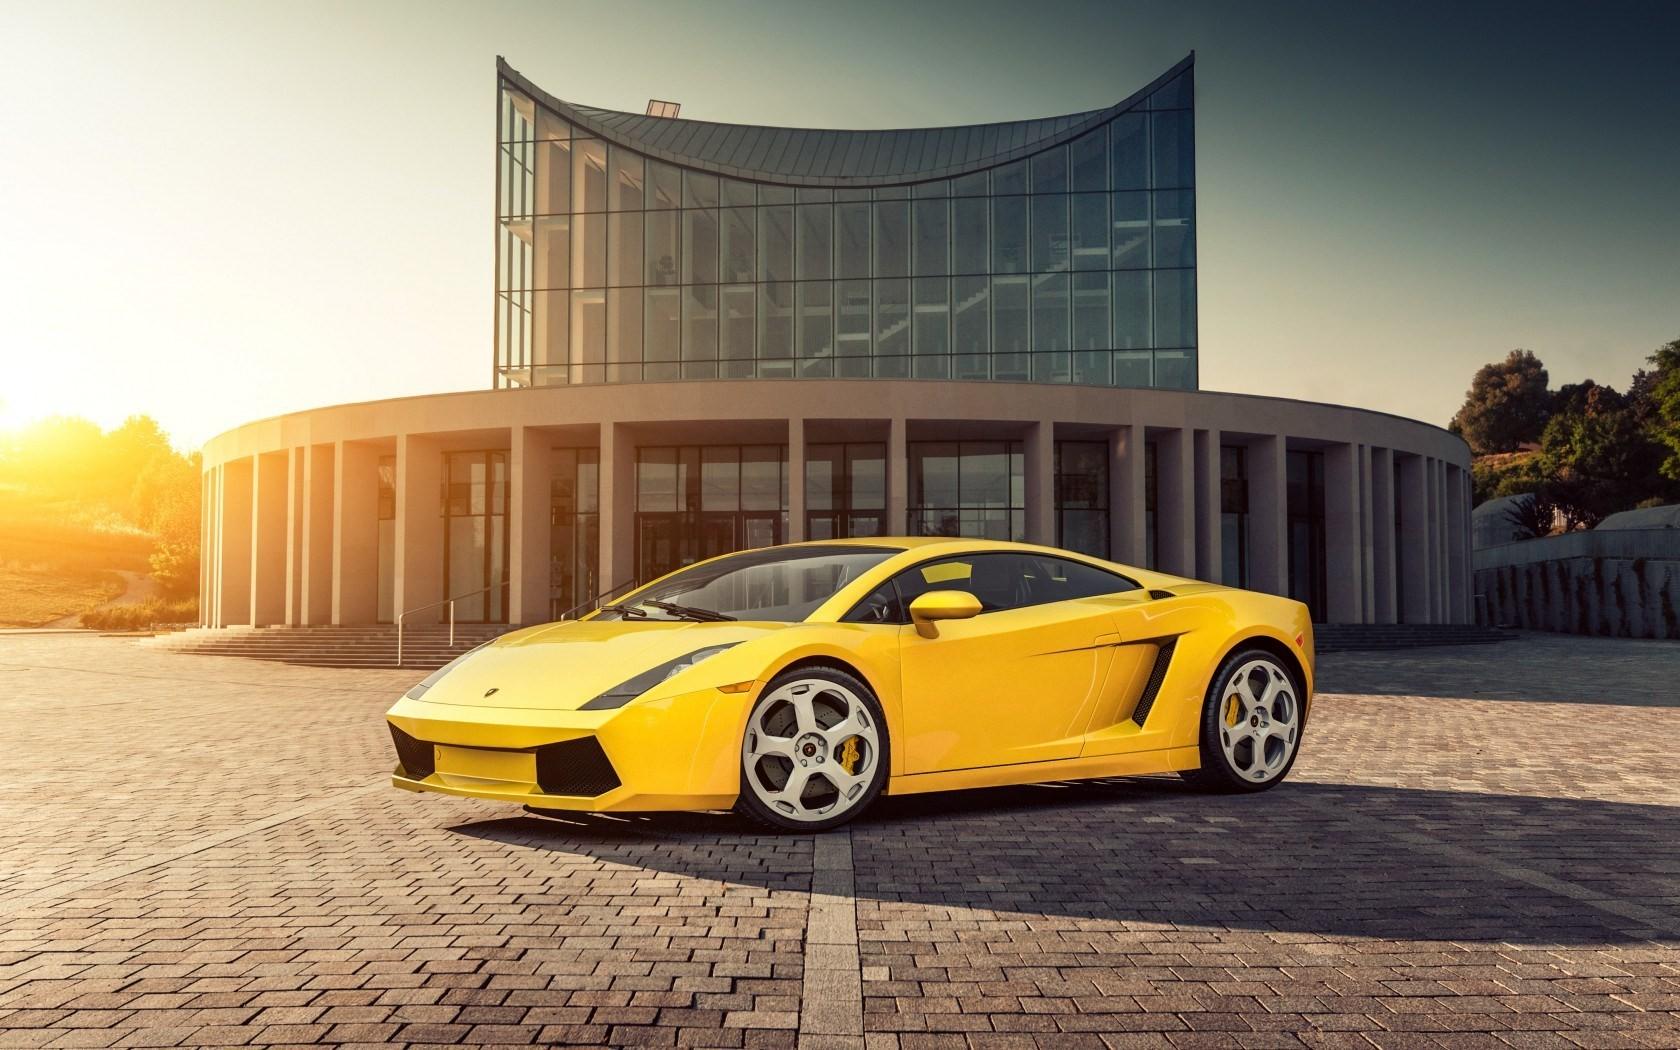 Hd Lamborghini Gallardo Wallpapers Wallpapersafari